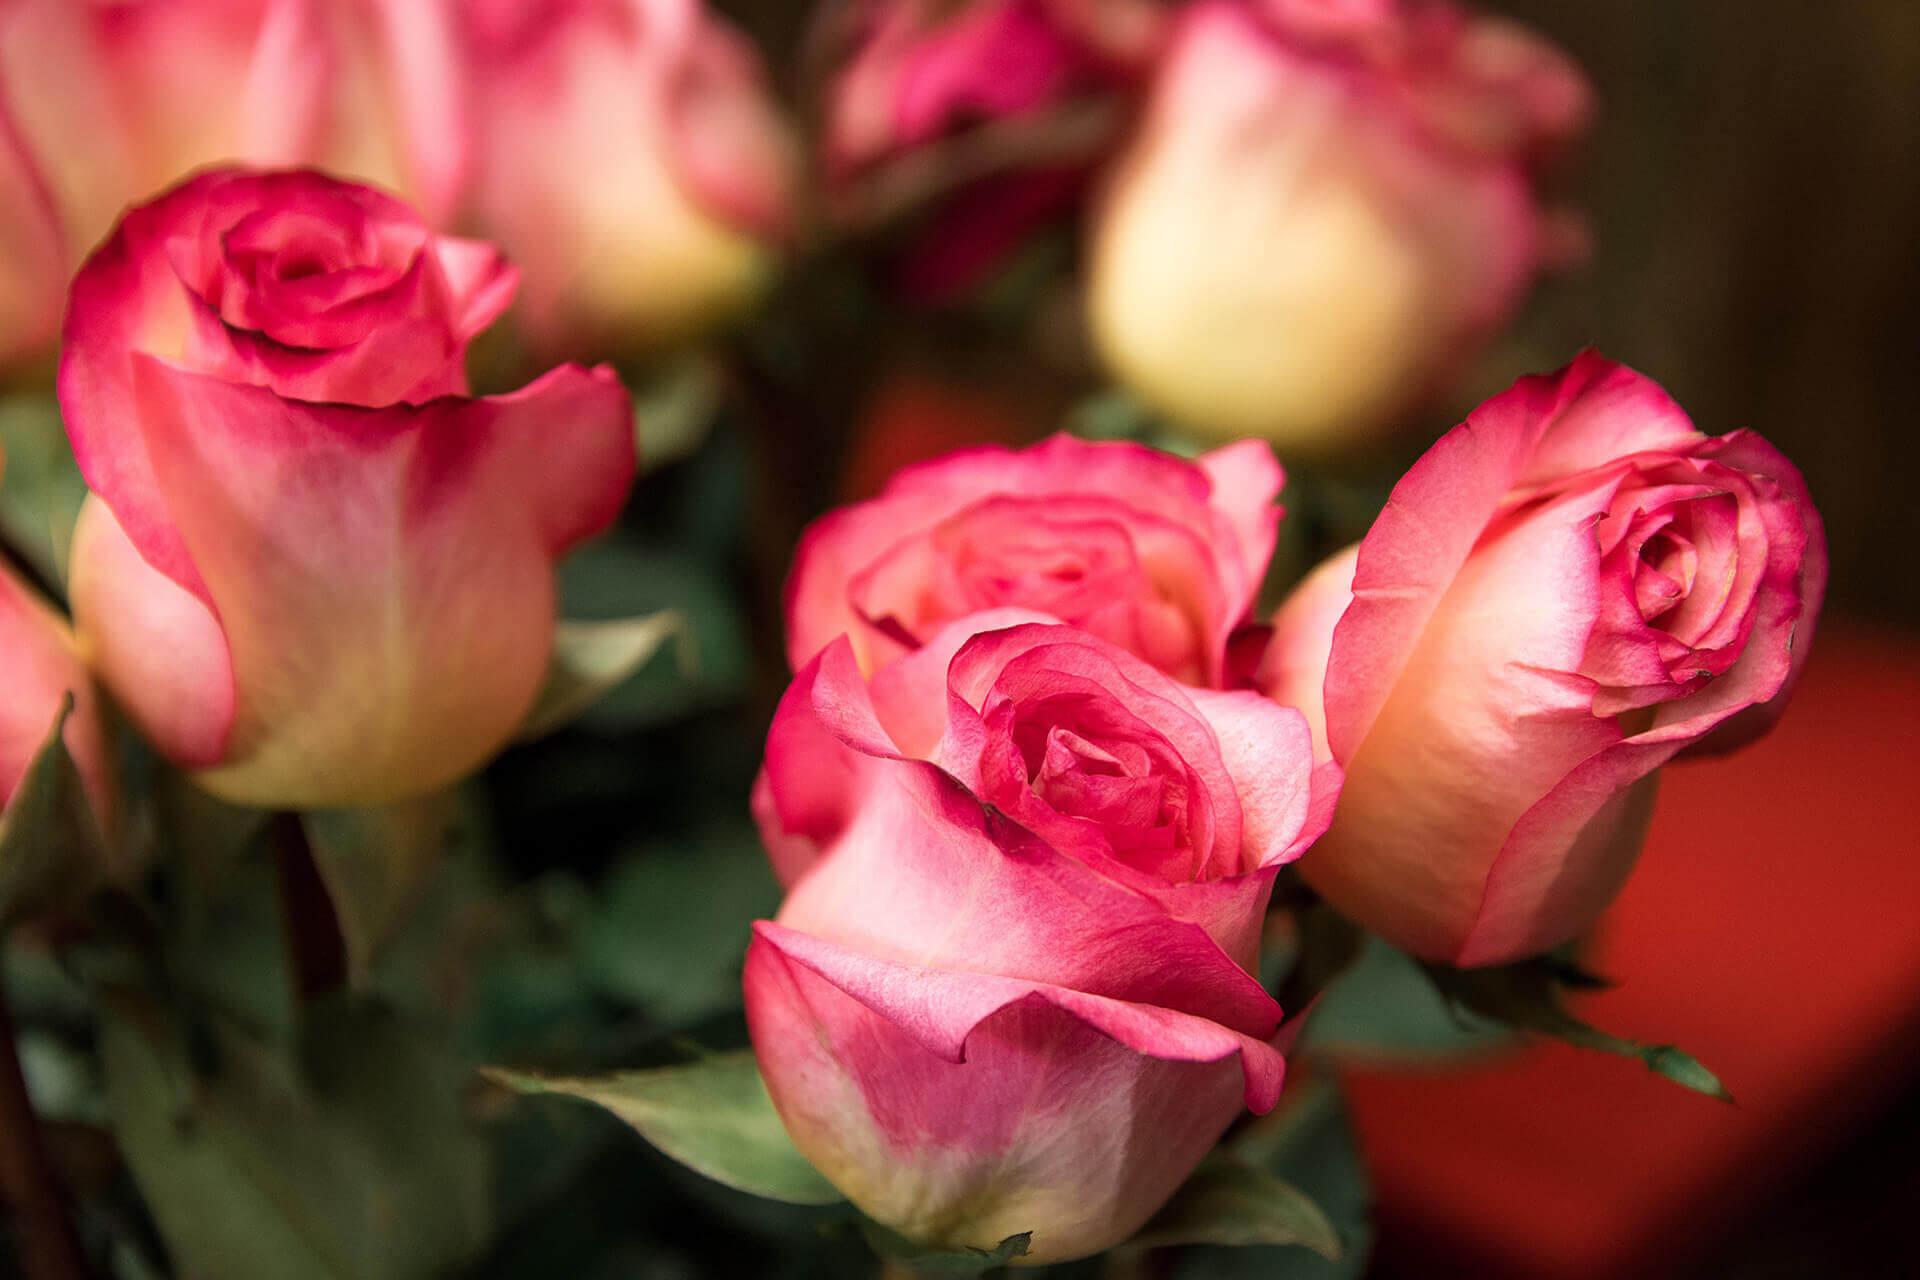 голландская роза бутон